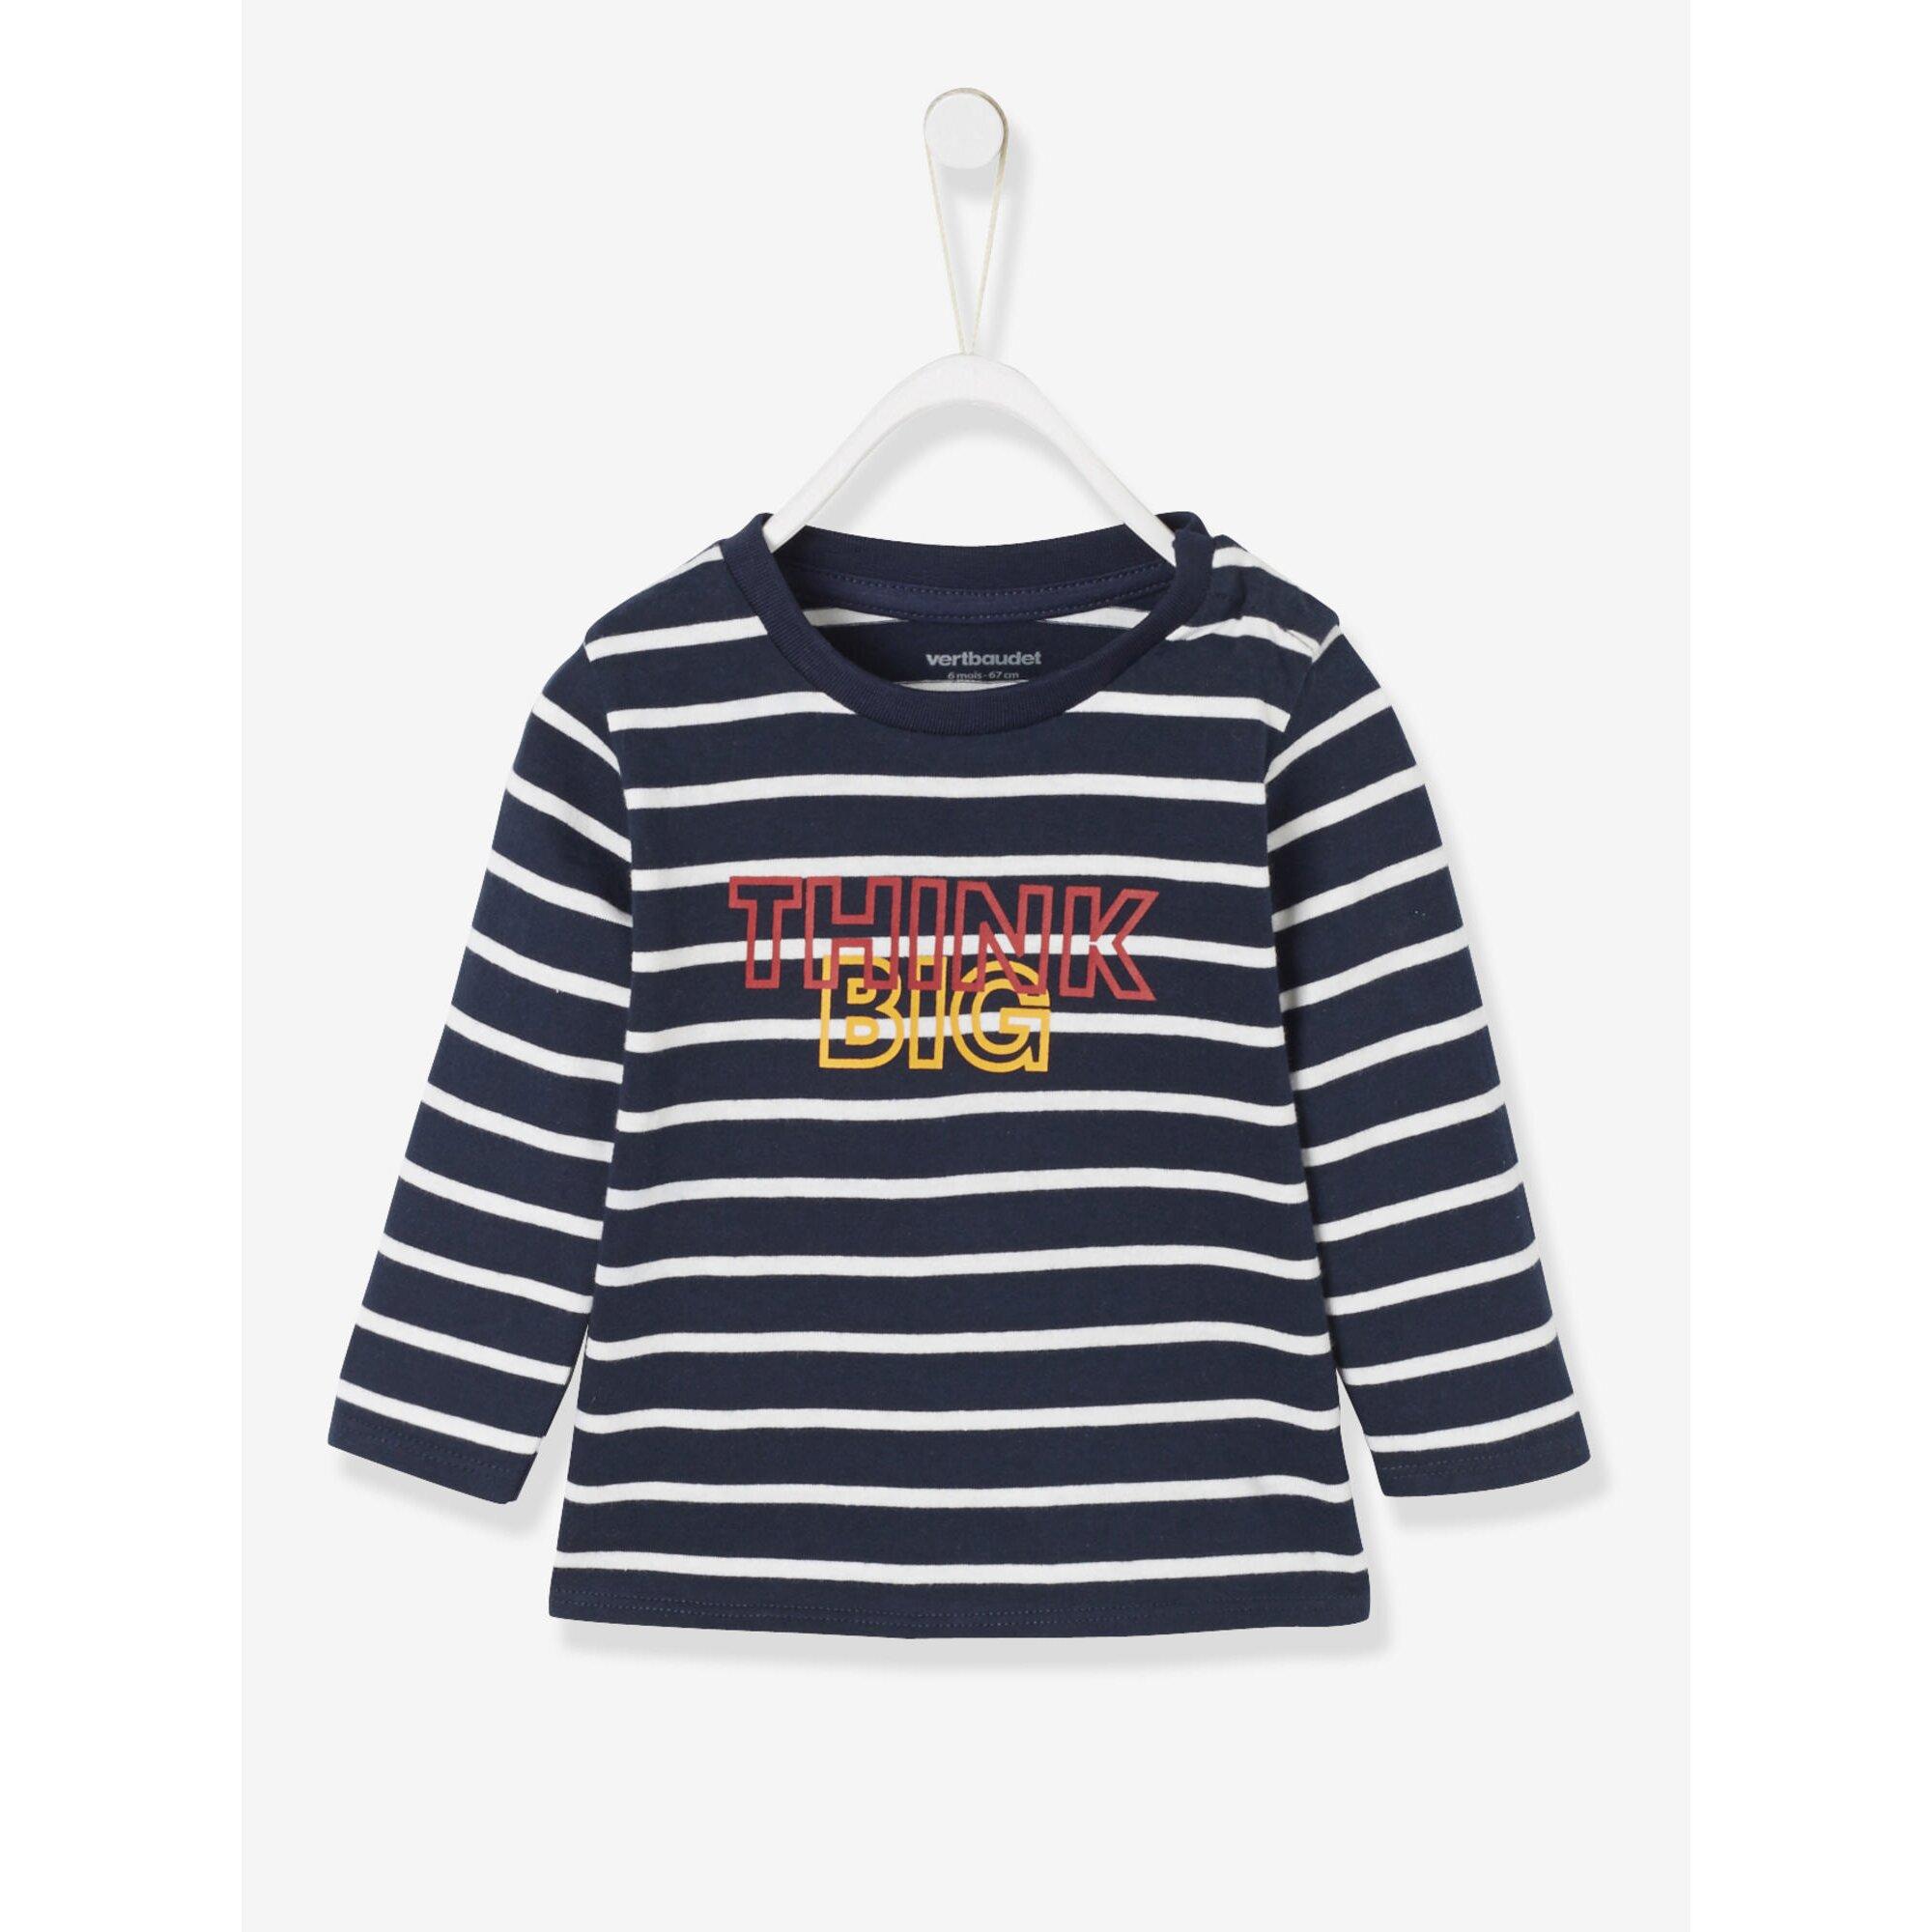 Vertbaudet Langarm-Shirt für Baby Jungen, bedruckt